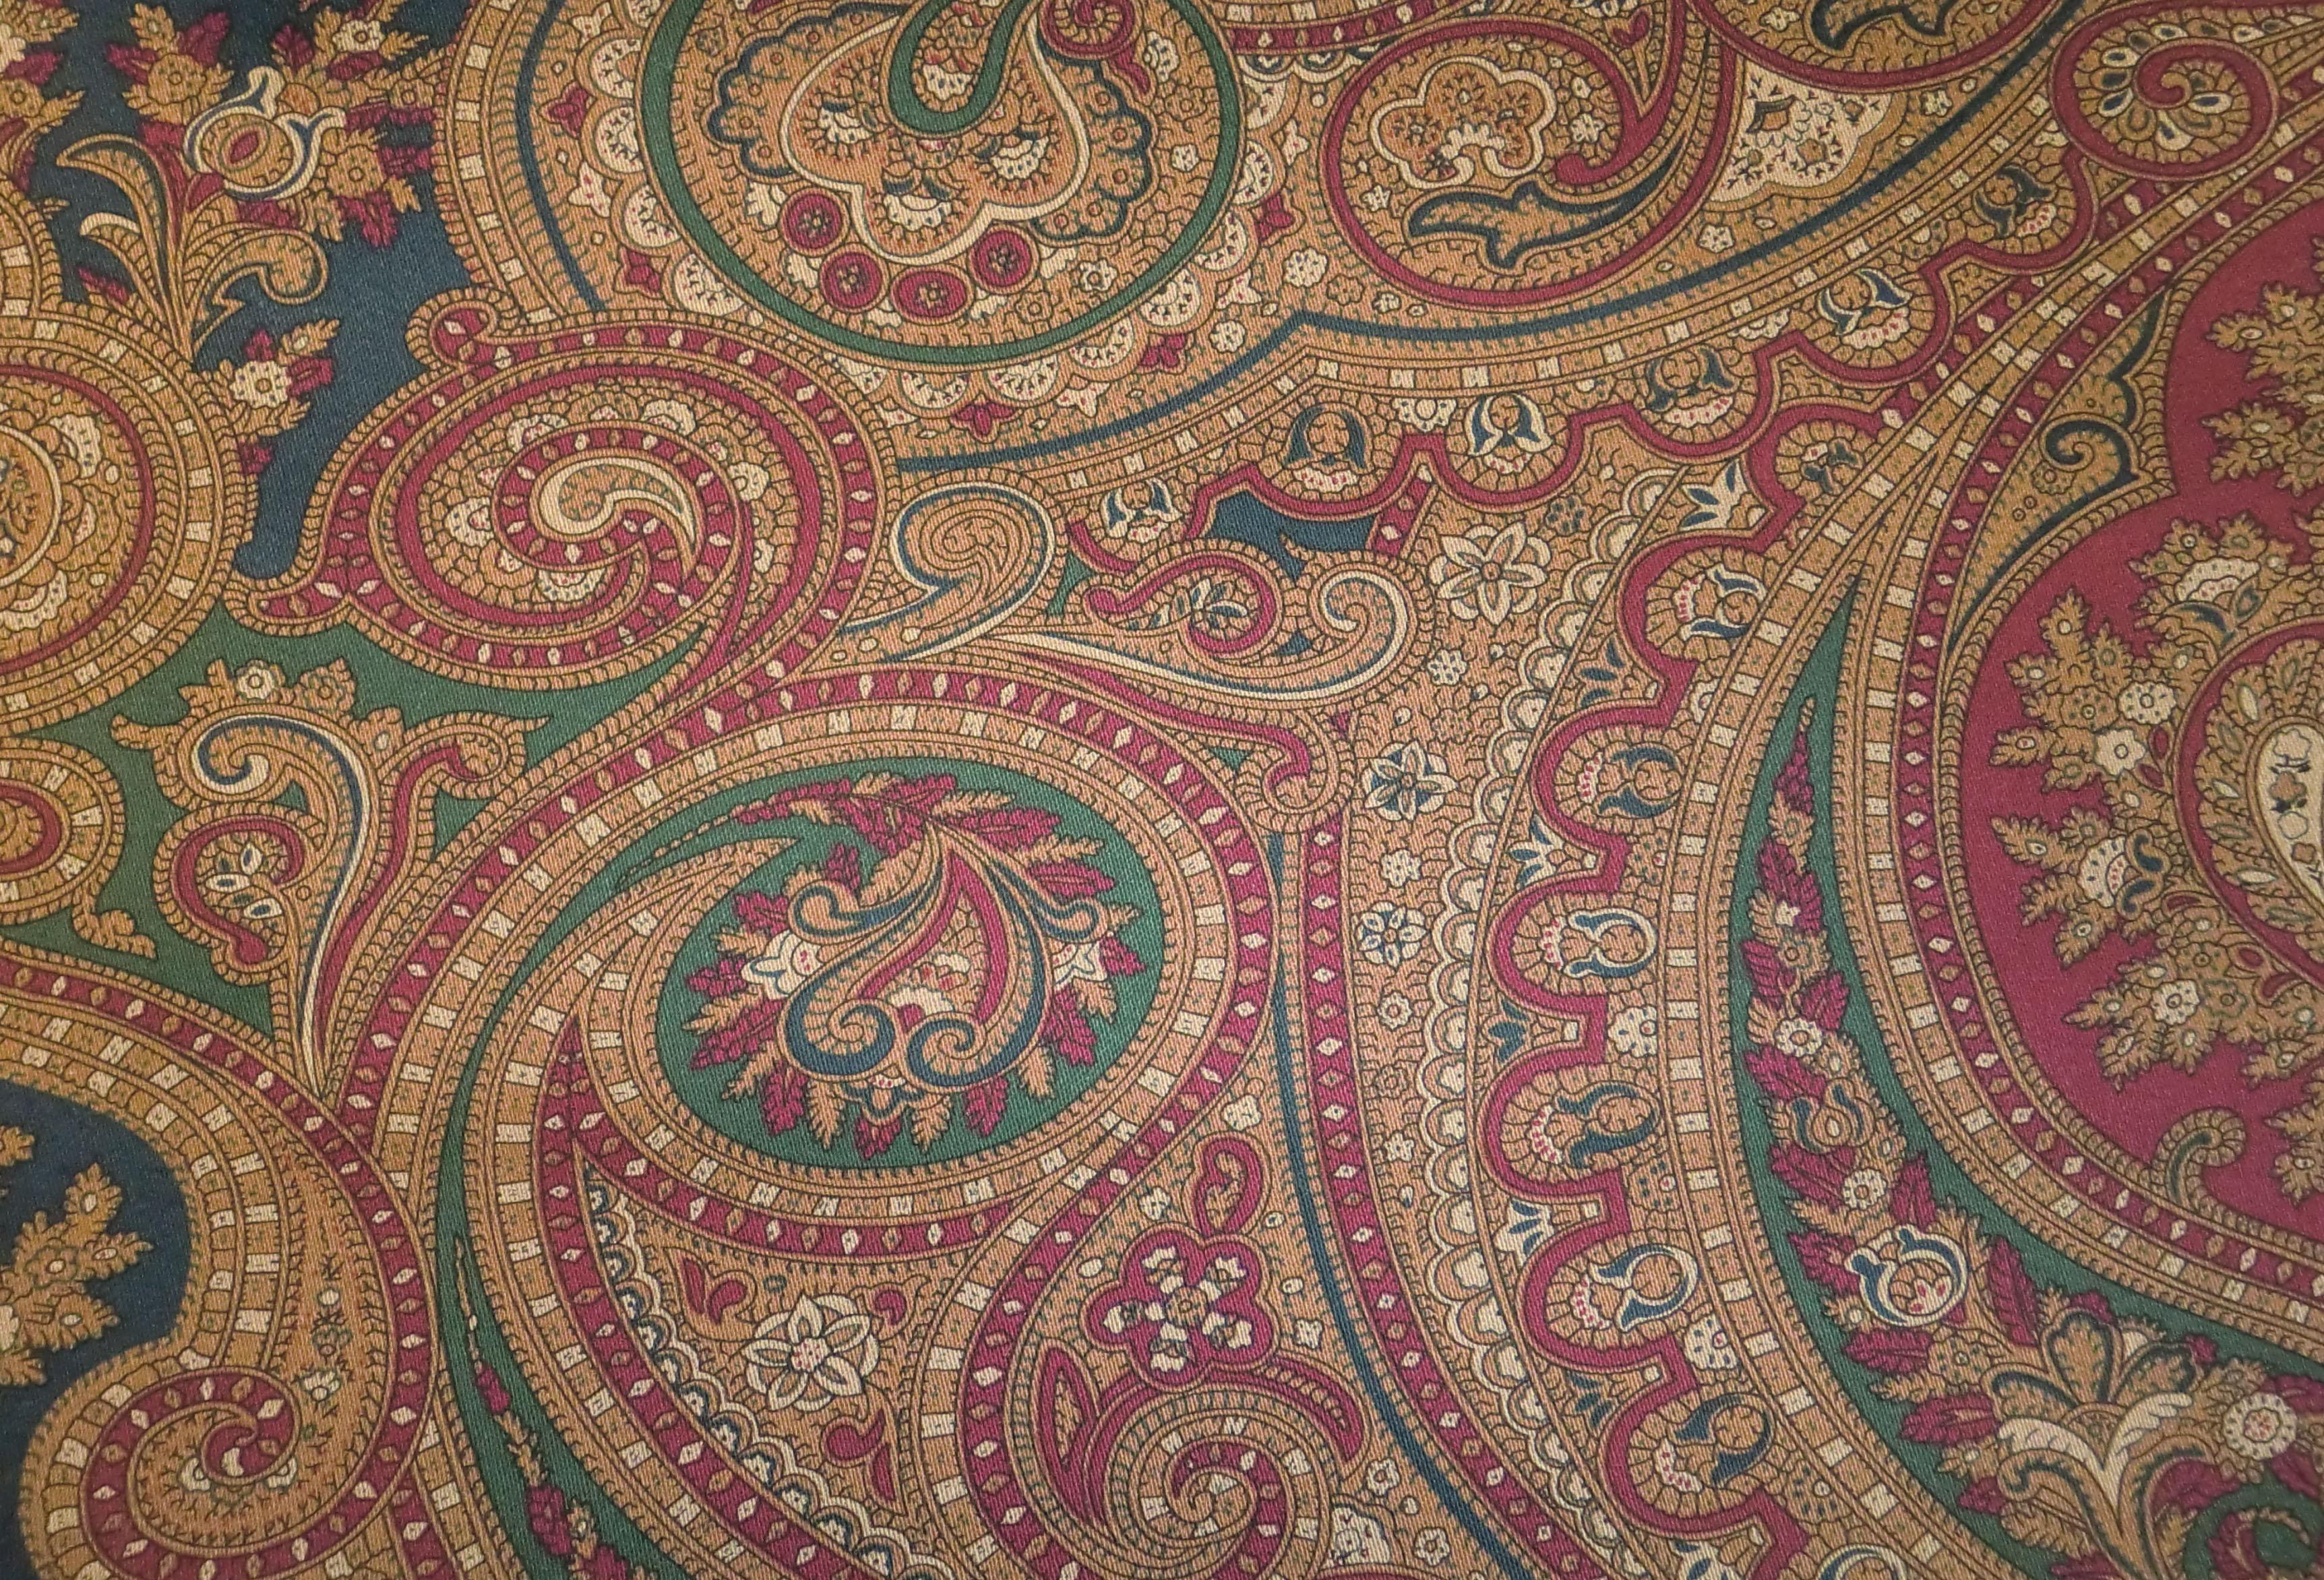 [49+] Ralph Lauren Paisley Wallpaper on WallpaperSafari